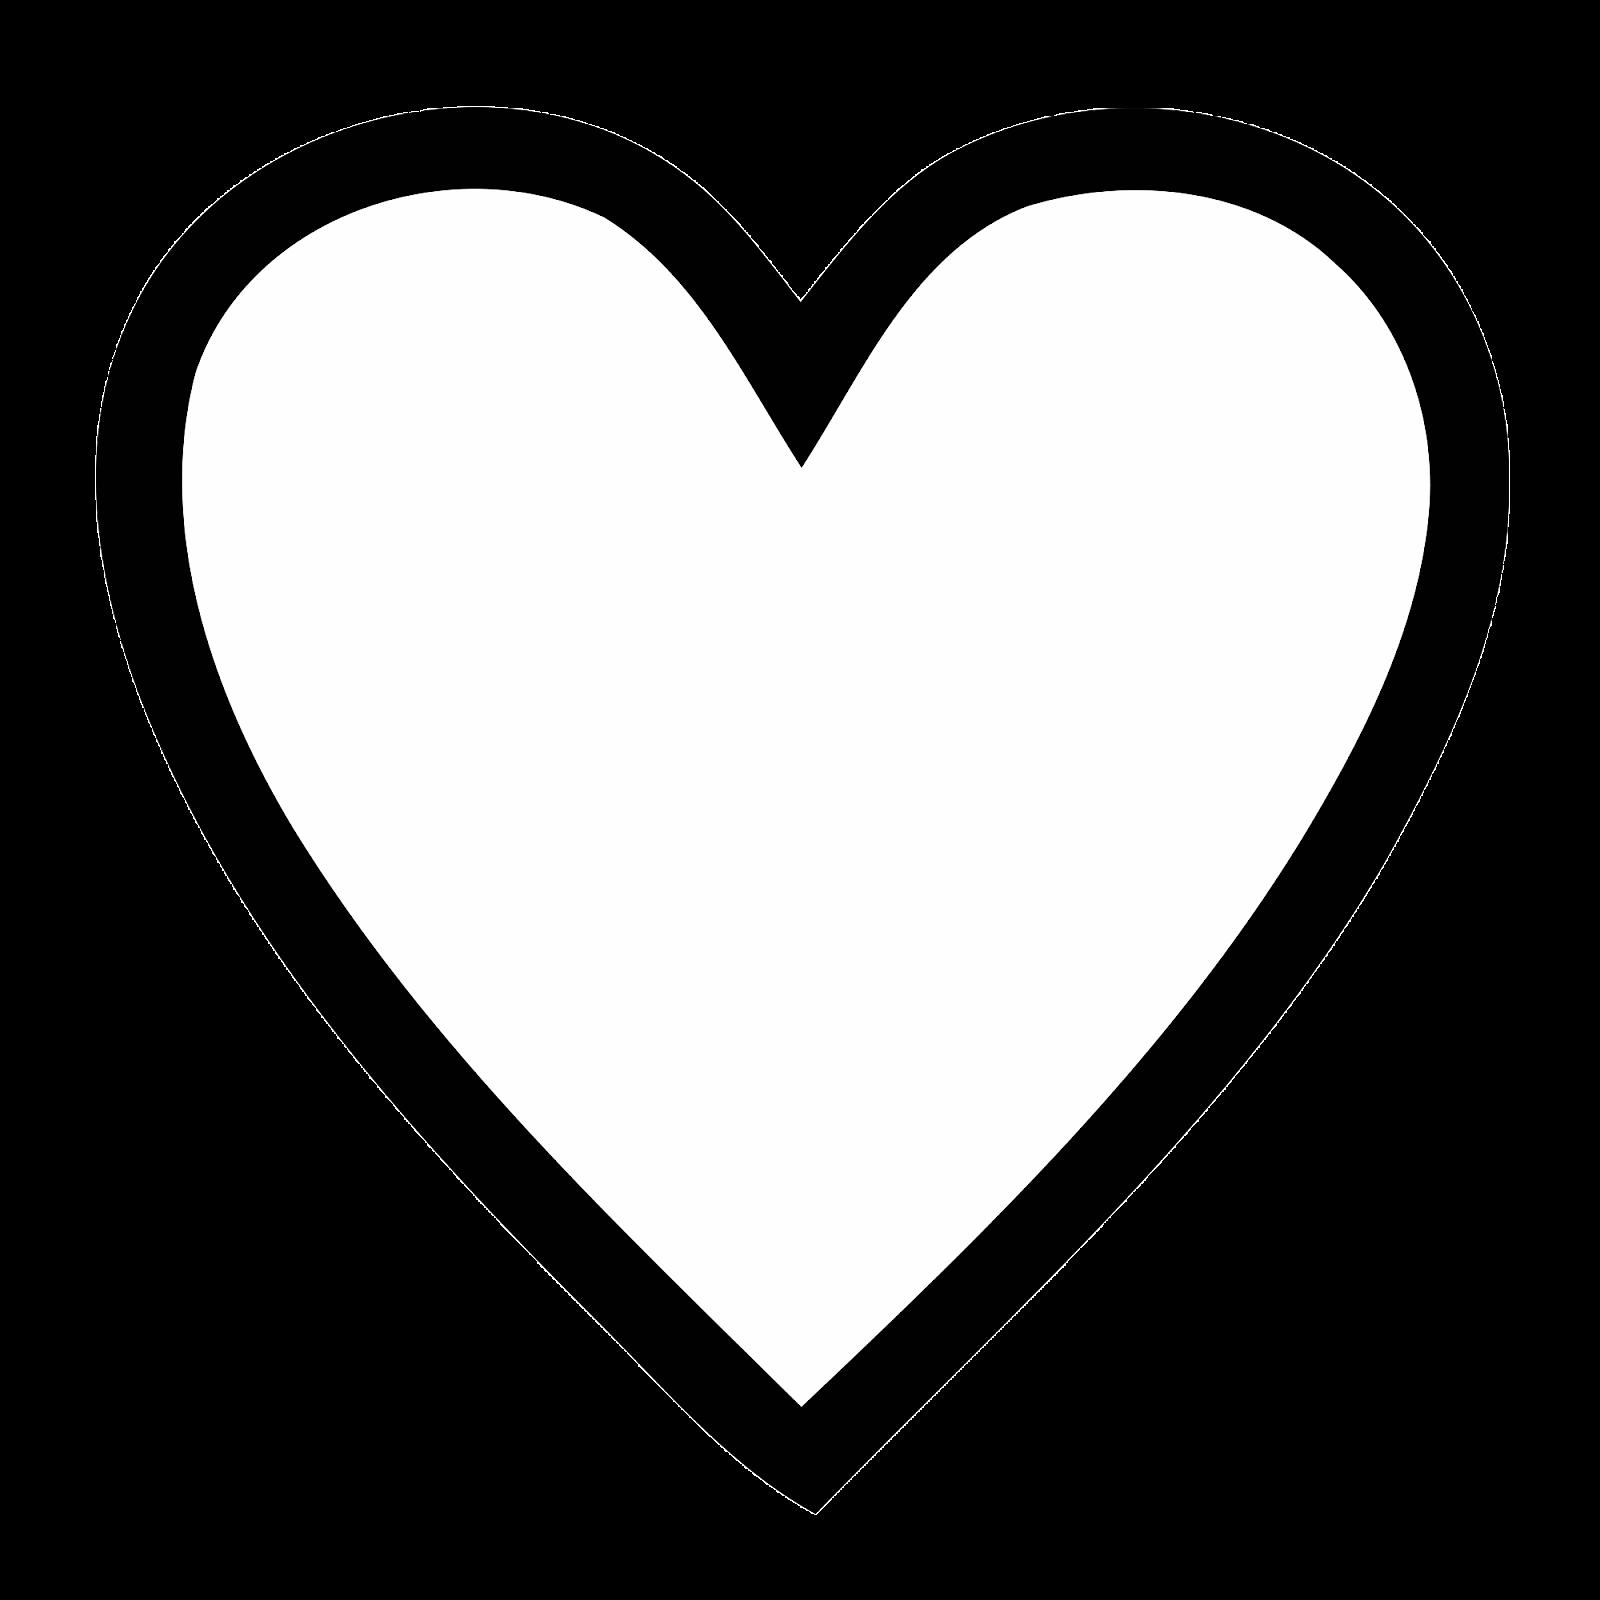 1600x1600 Drawn Heart Black And White